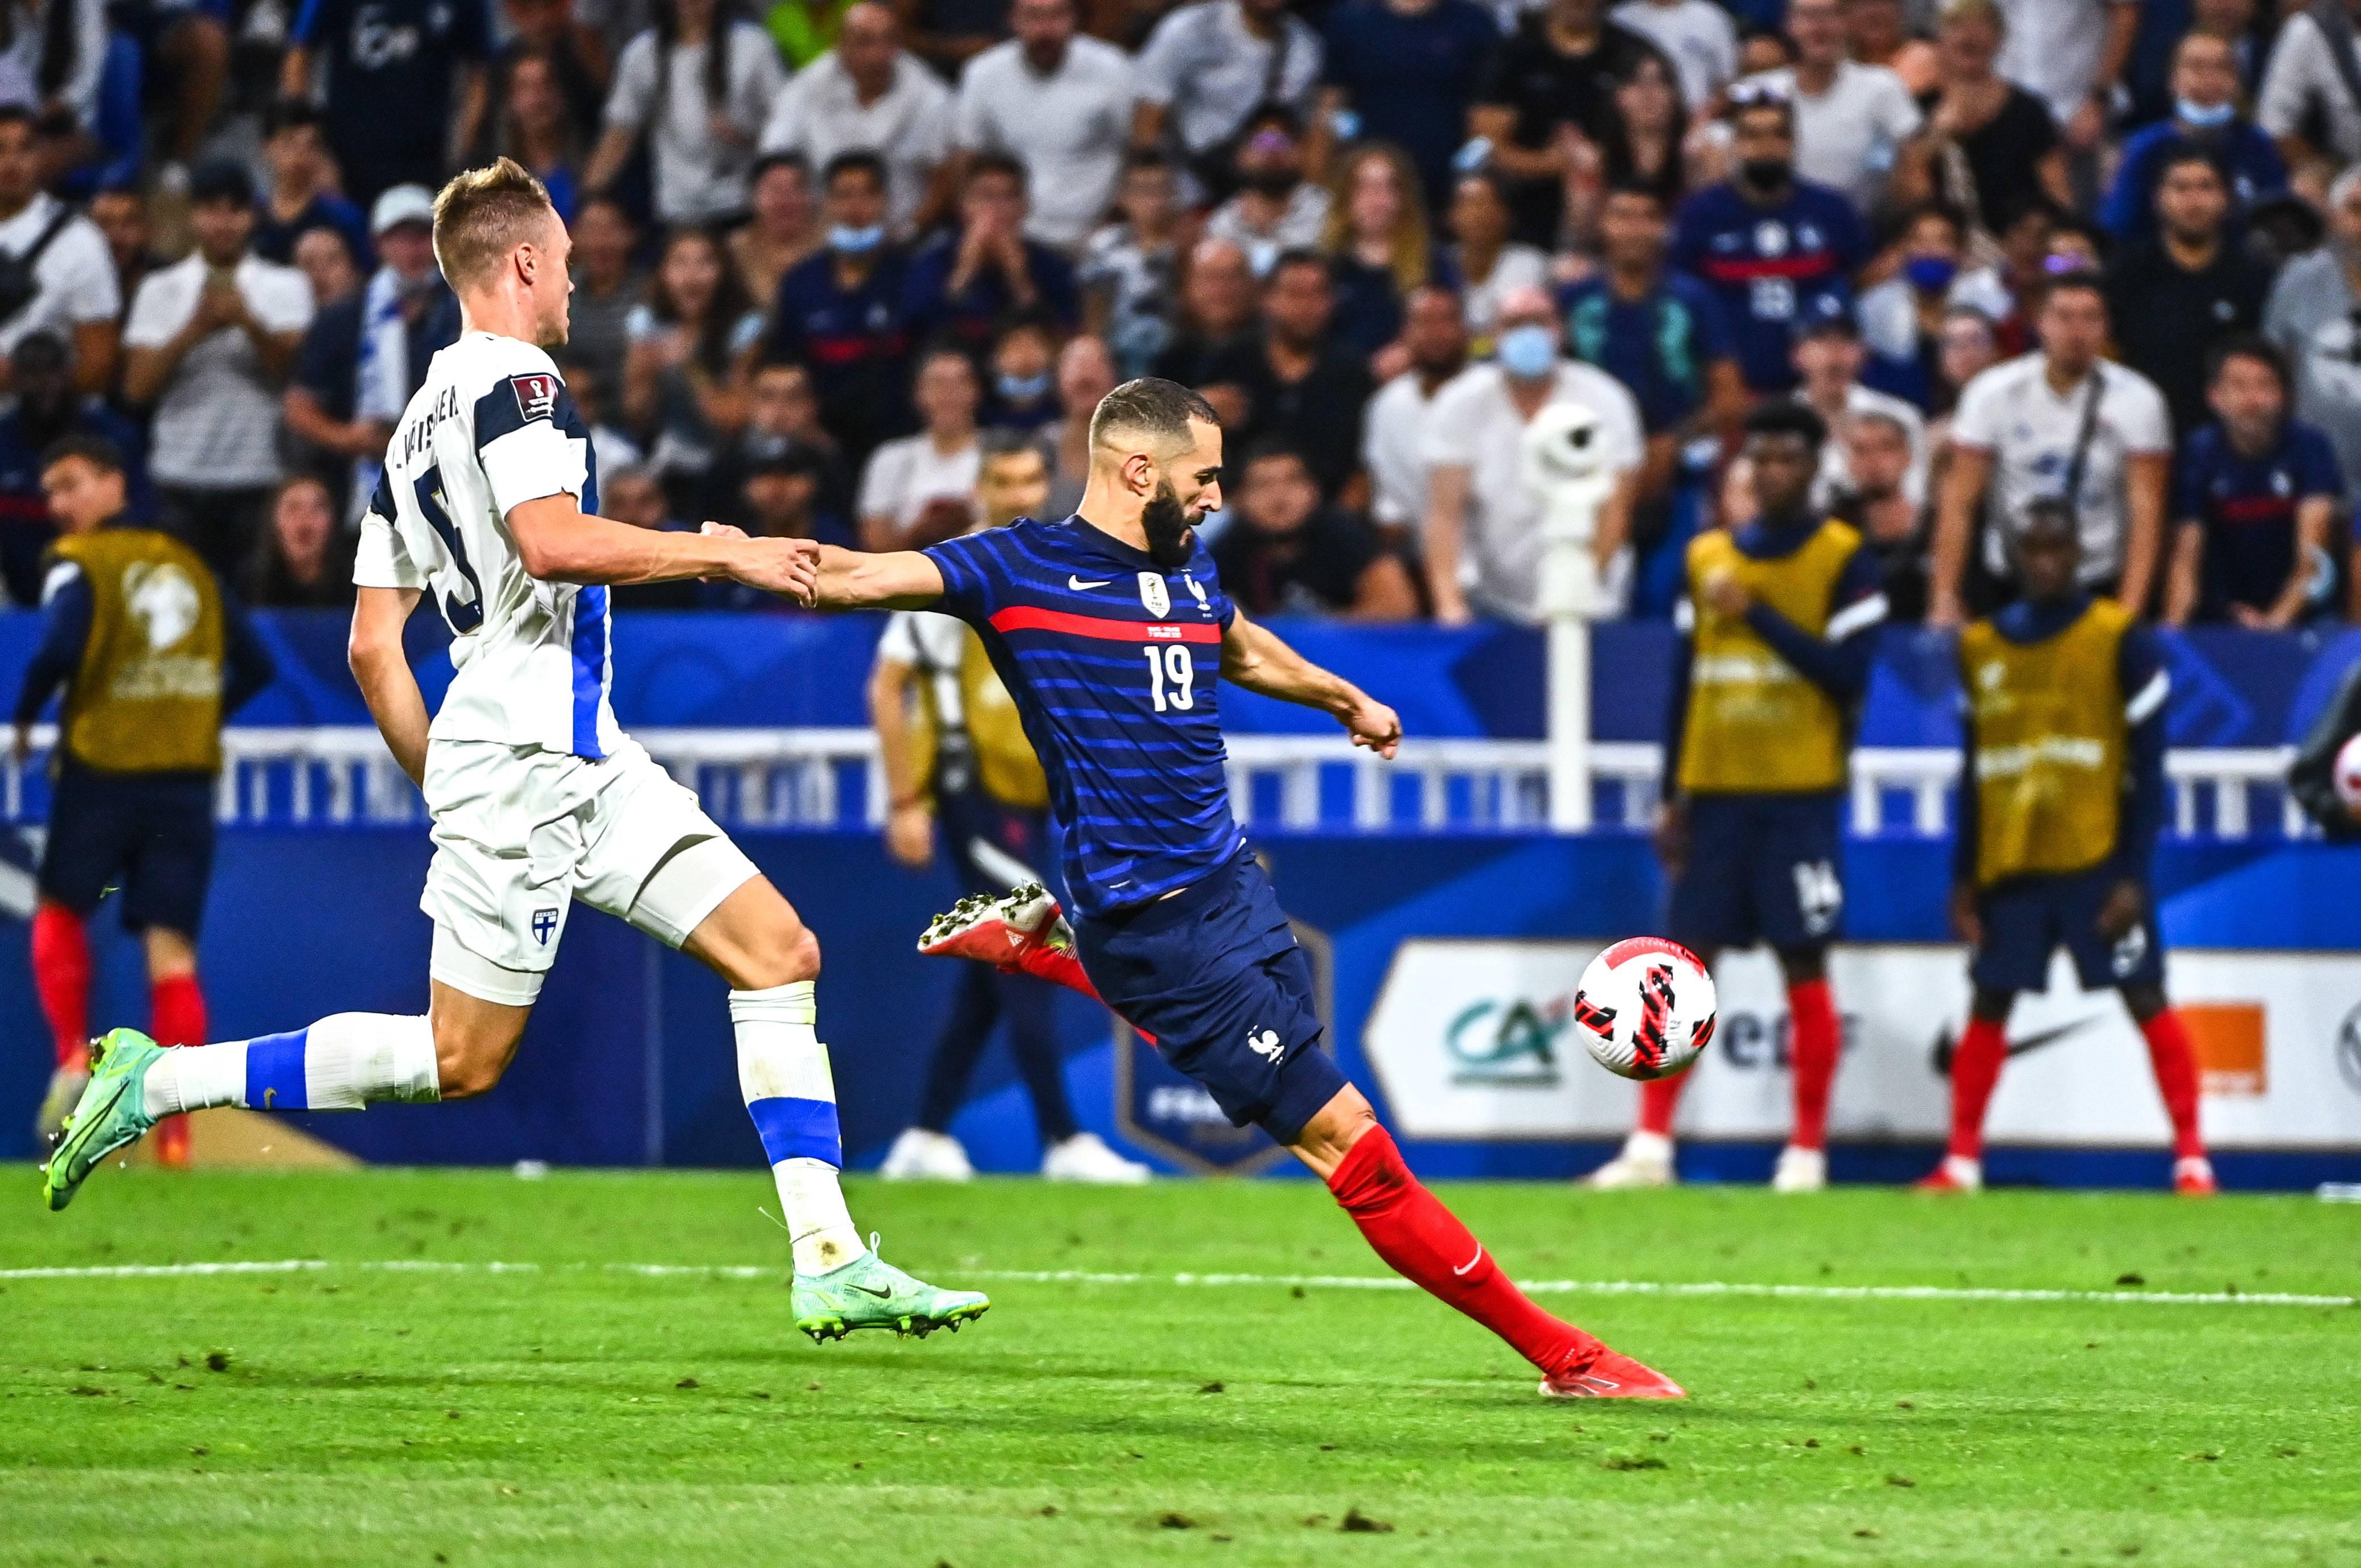 La reprise de volée pied gauche de Karim Benzema